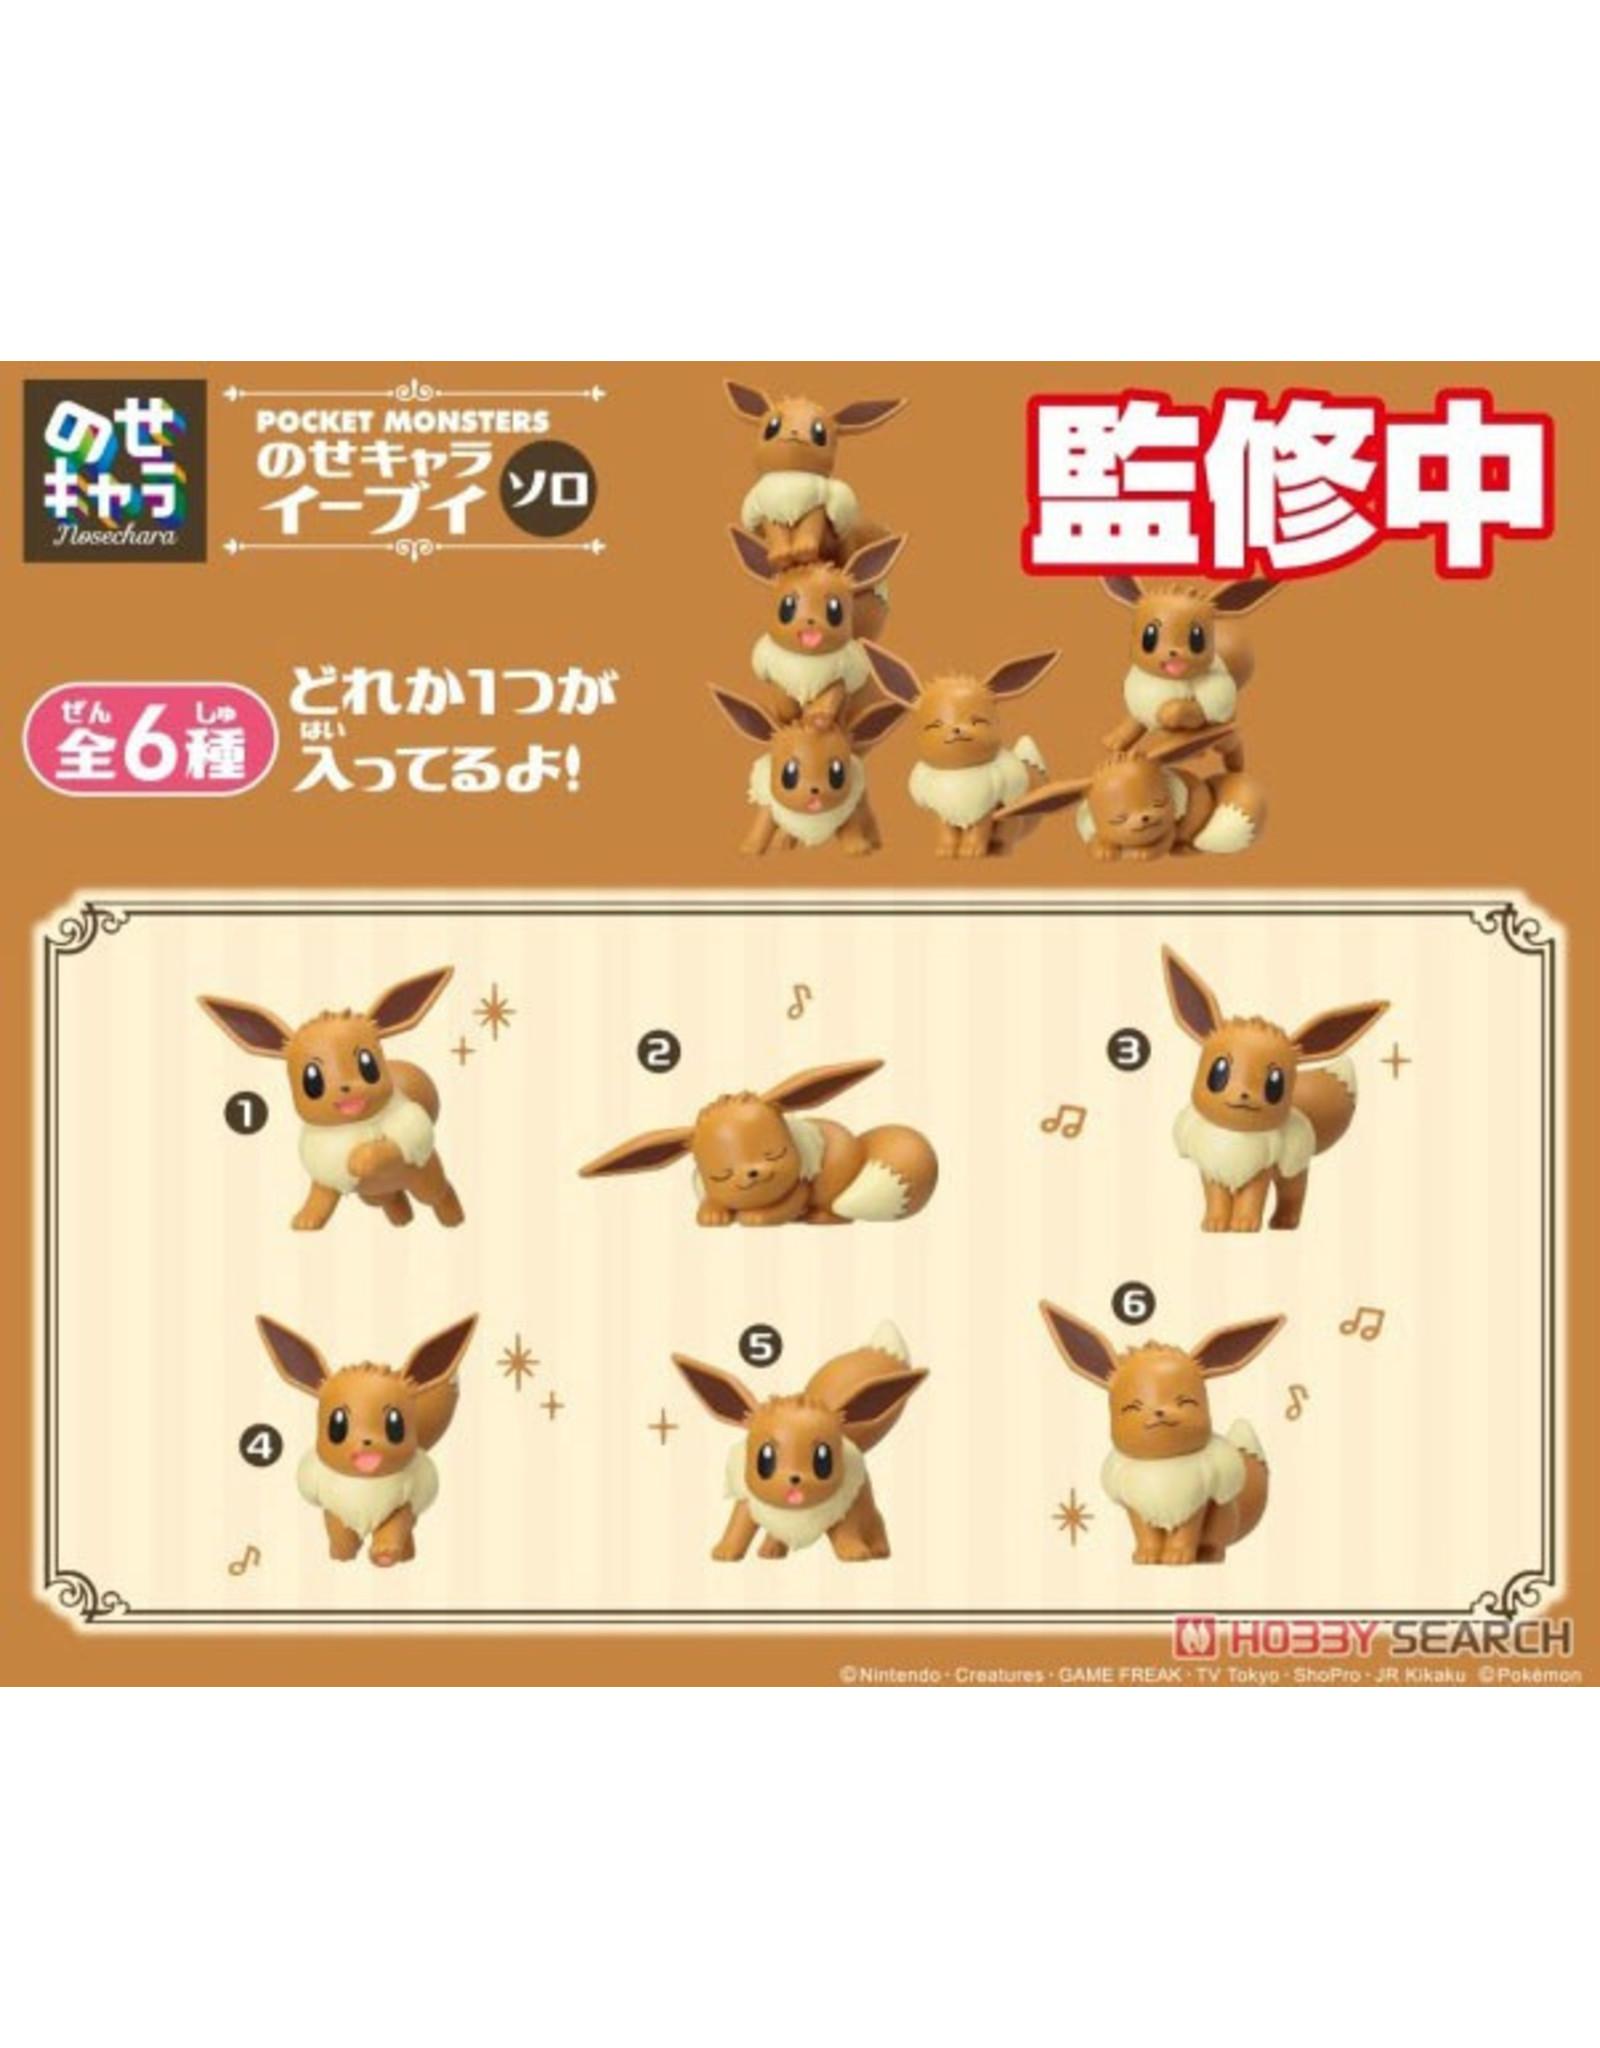 Eevee - Pokemon Character Figure NOS-79 - Blind box of 1